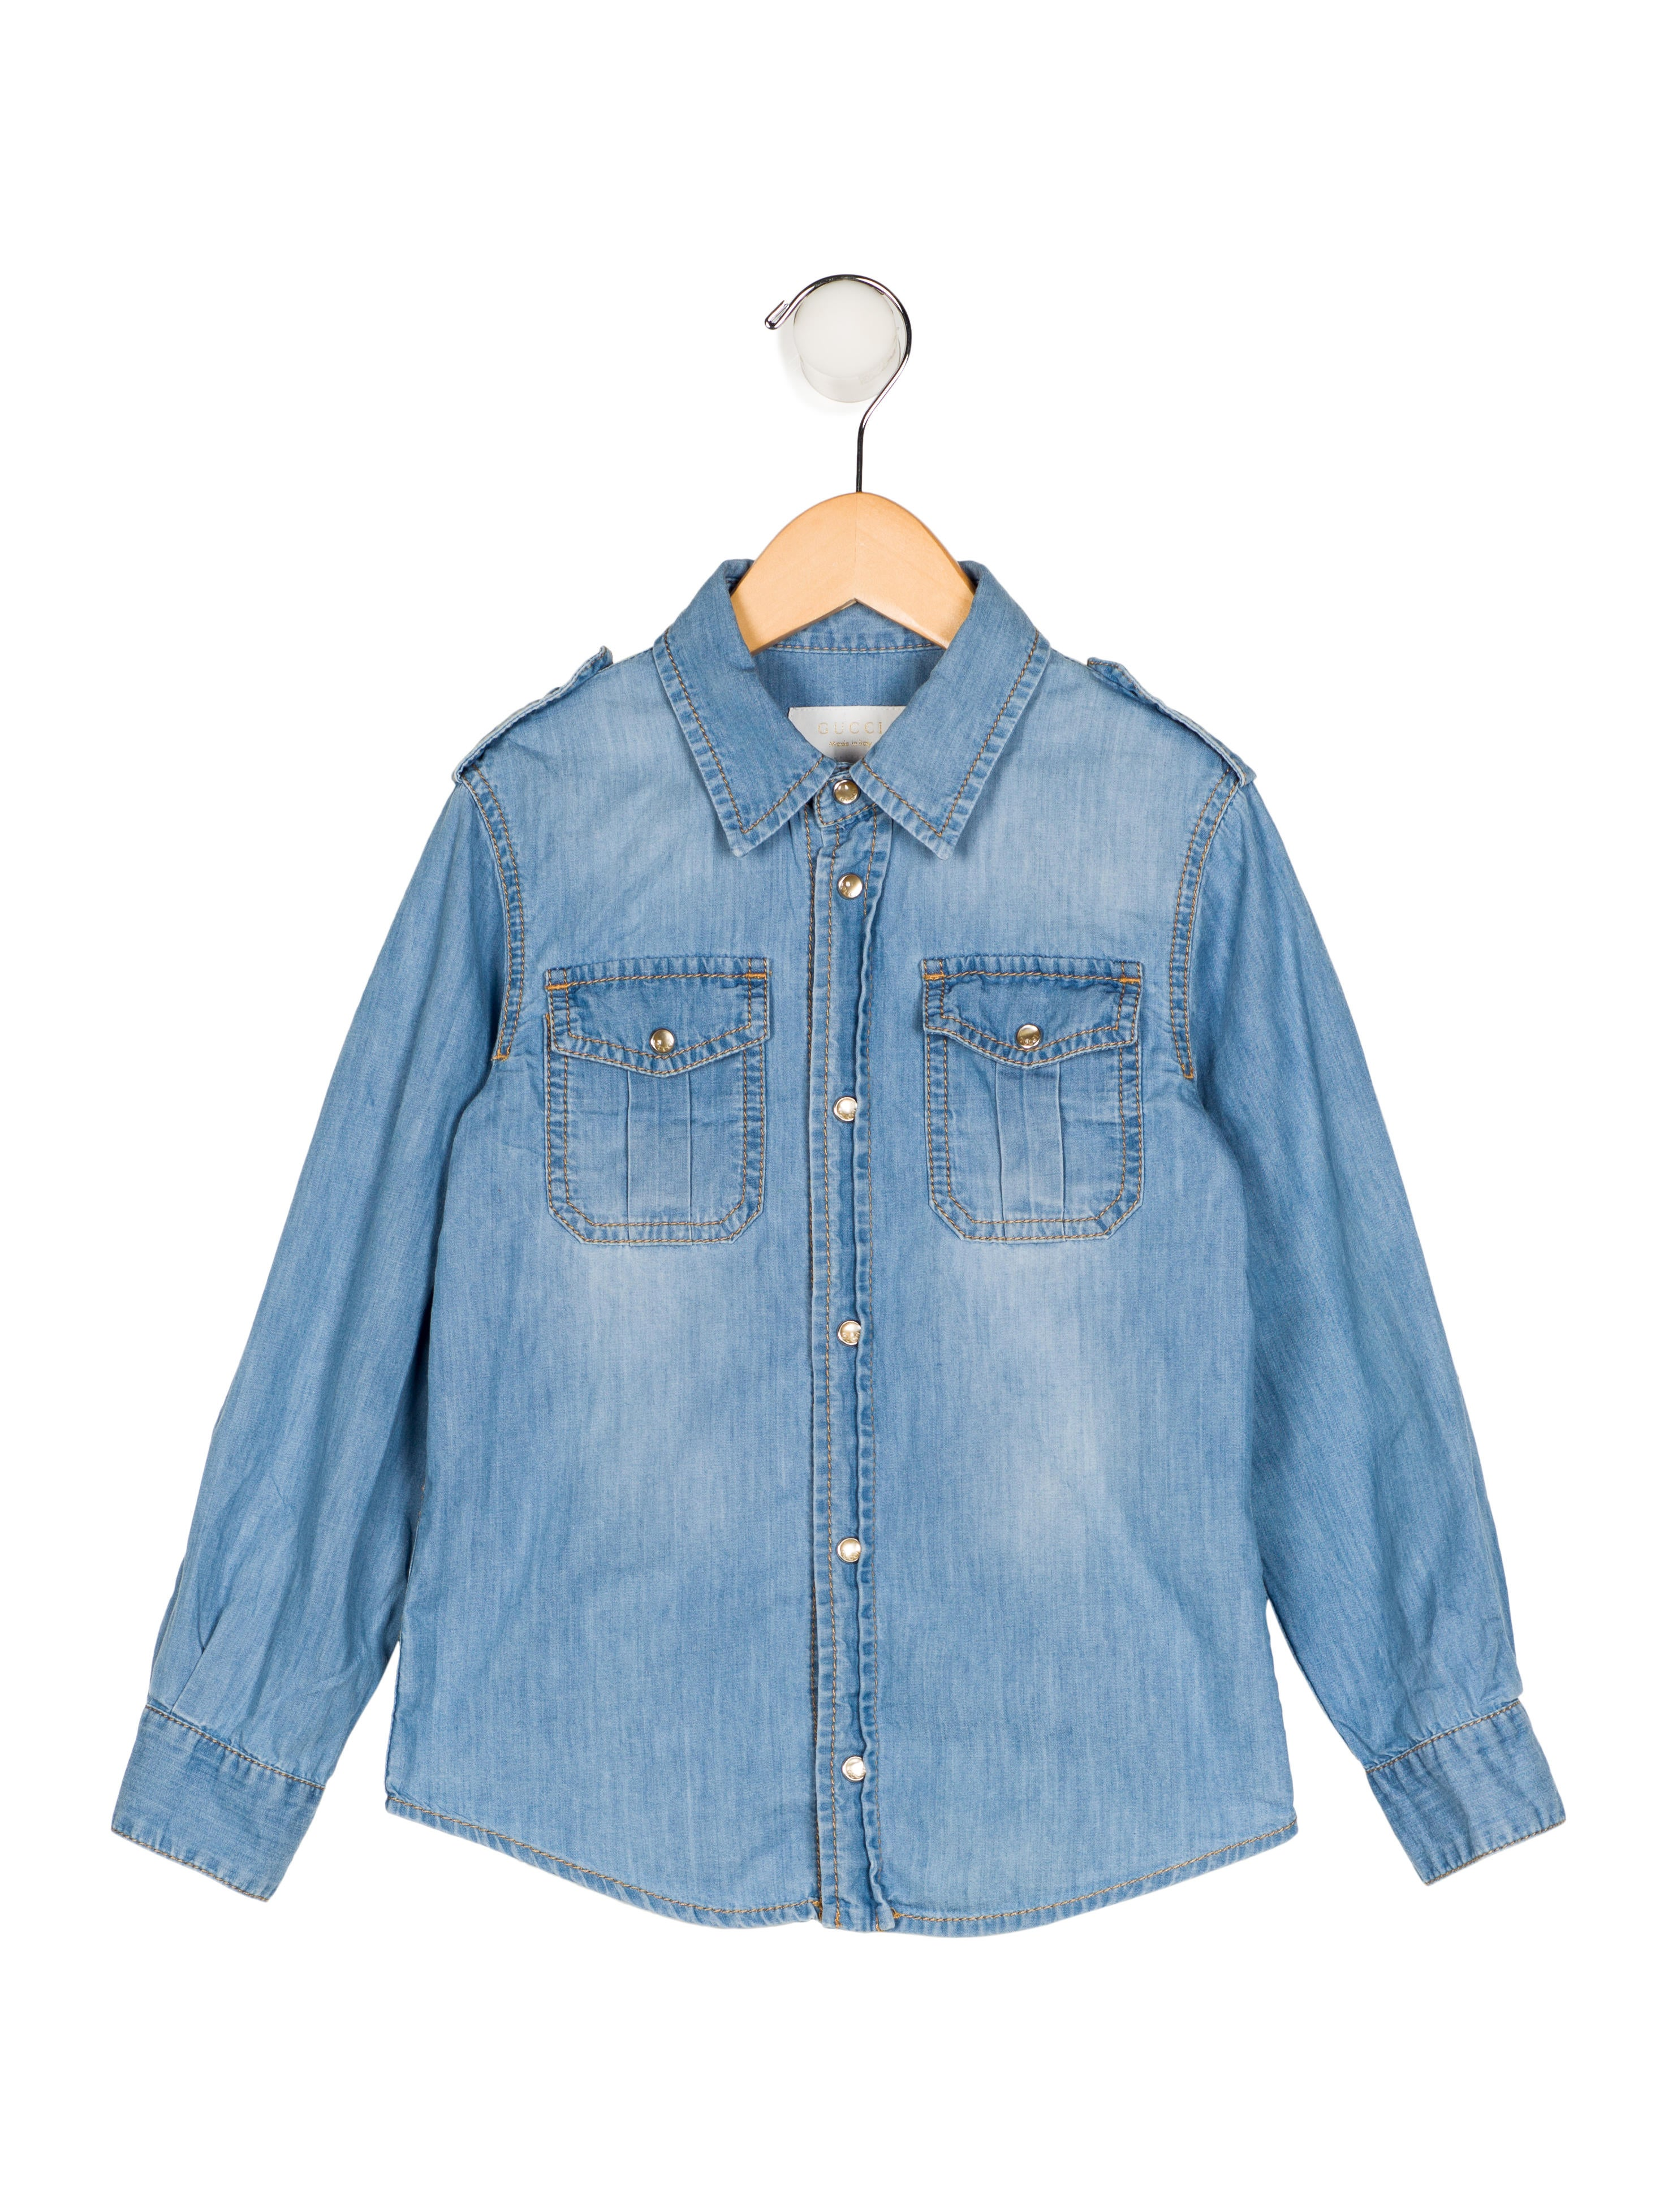 Gucci boys 39 chambray long sleeve shirt boys guc171727 for Chambray shirt for kids